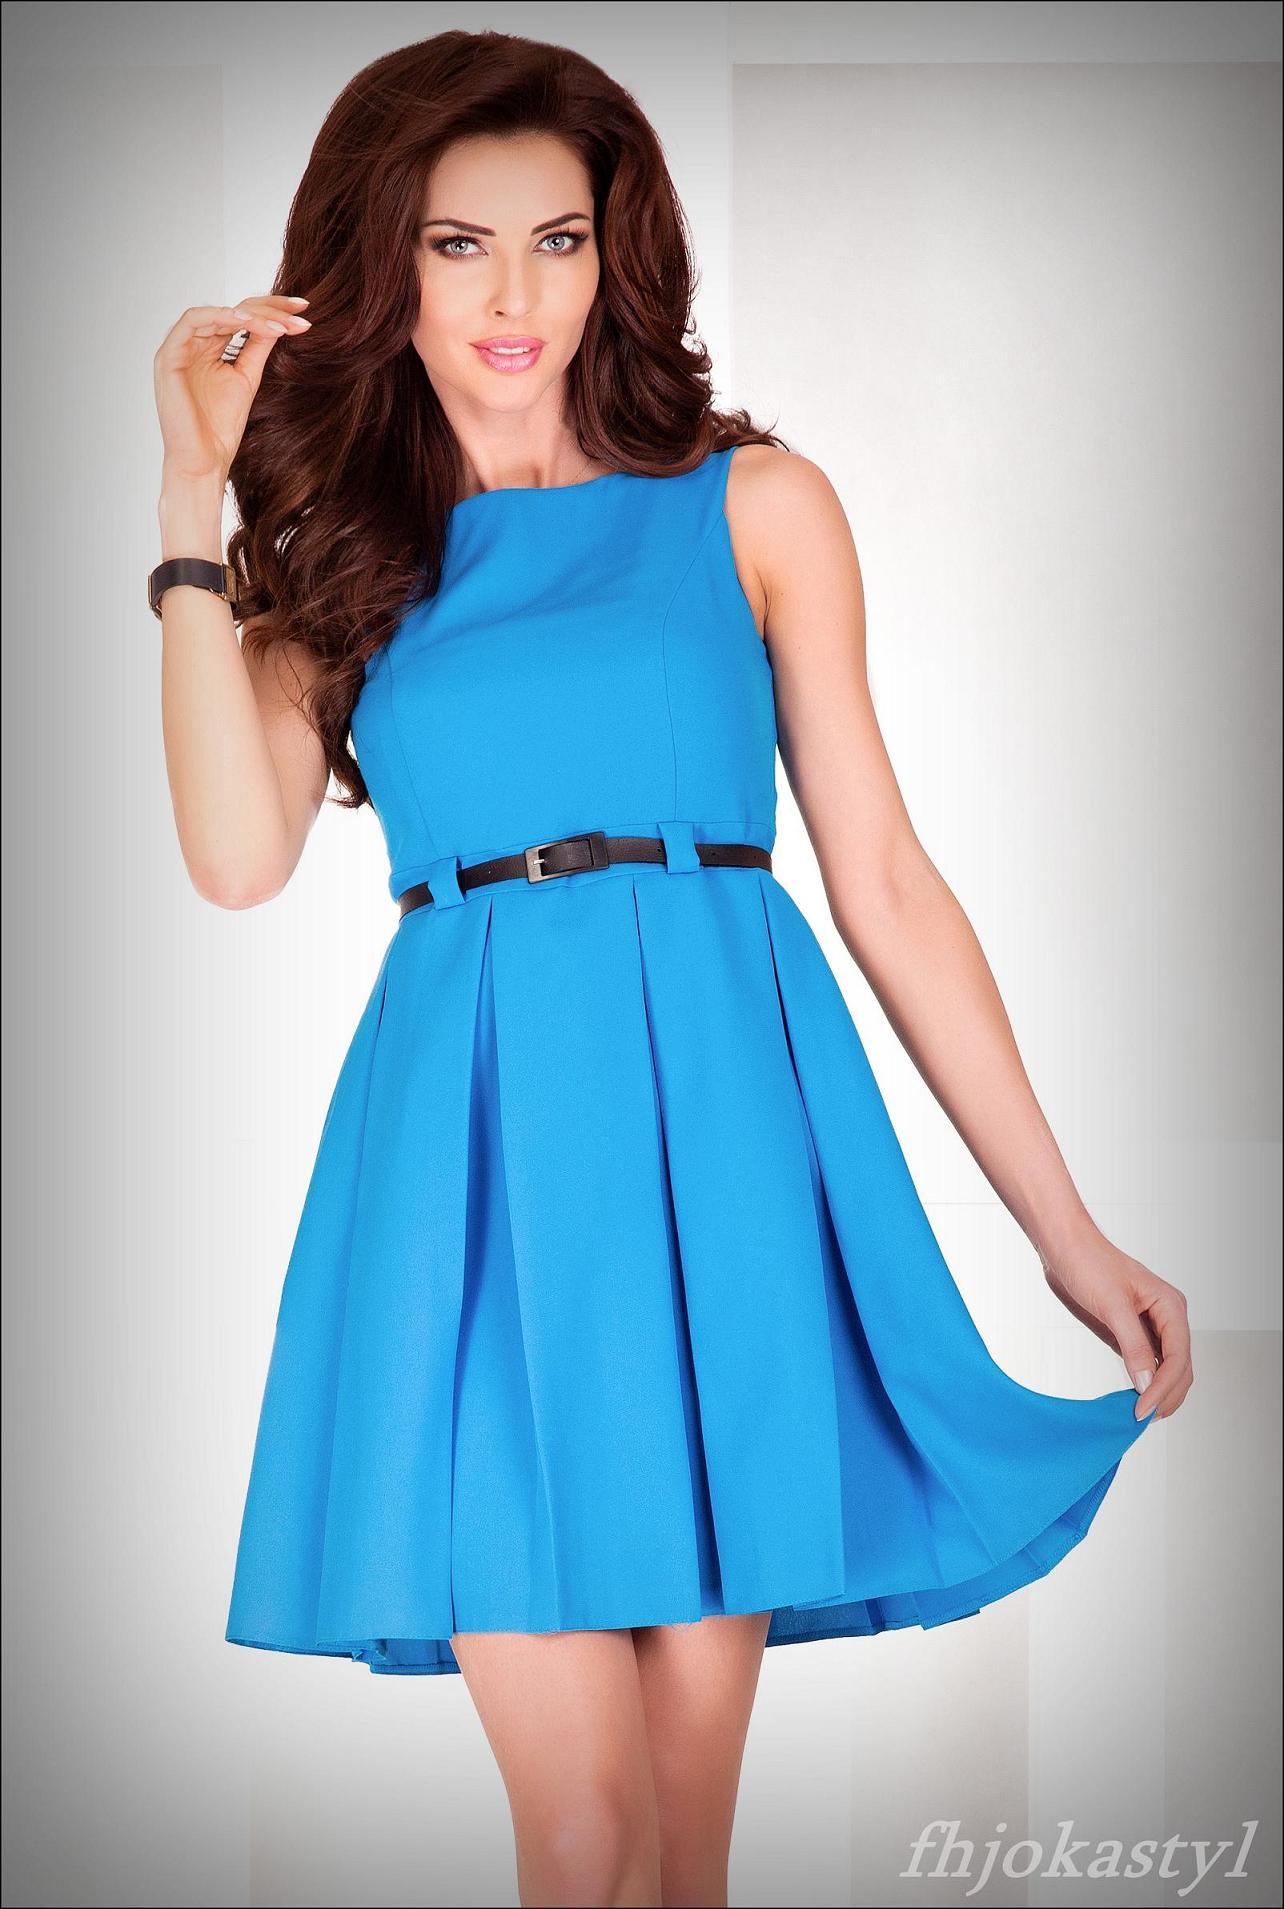 c04ff797b6 Jokastyl  Rozkloszowana Sukienka Niebieska L 40